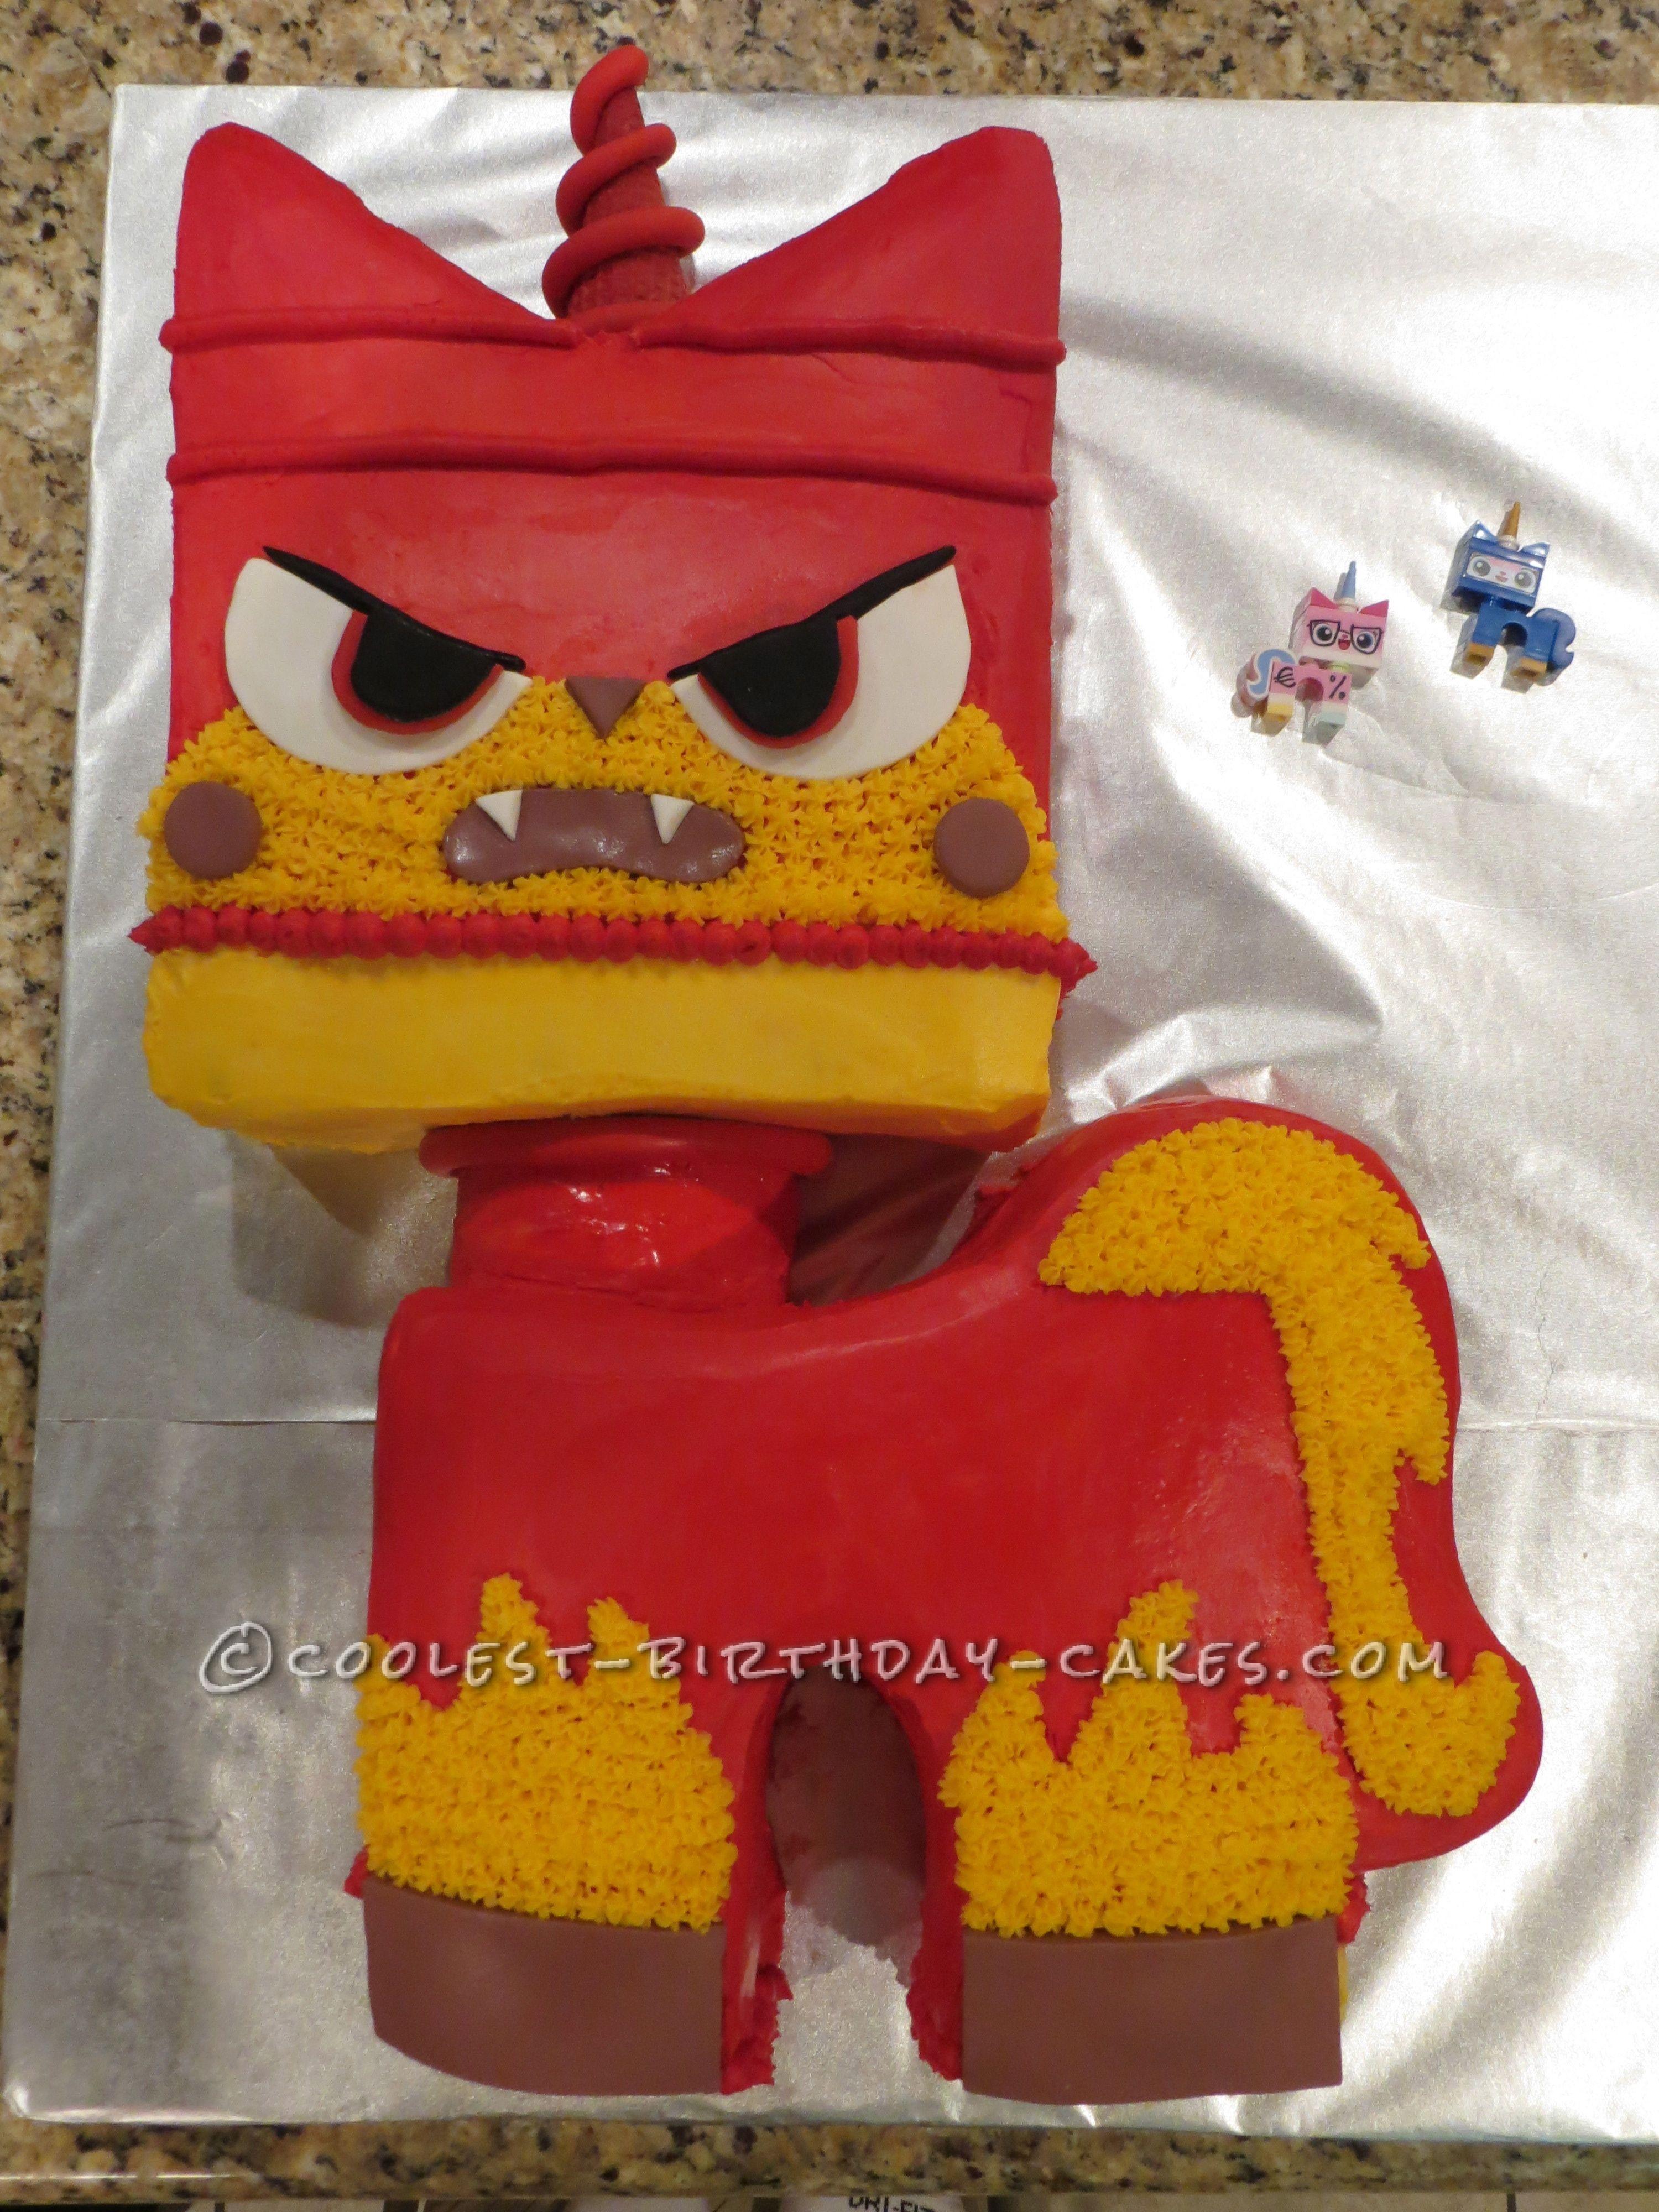 Awesome LEGO Angry Kitty Cake